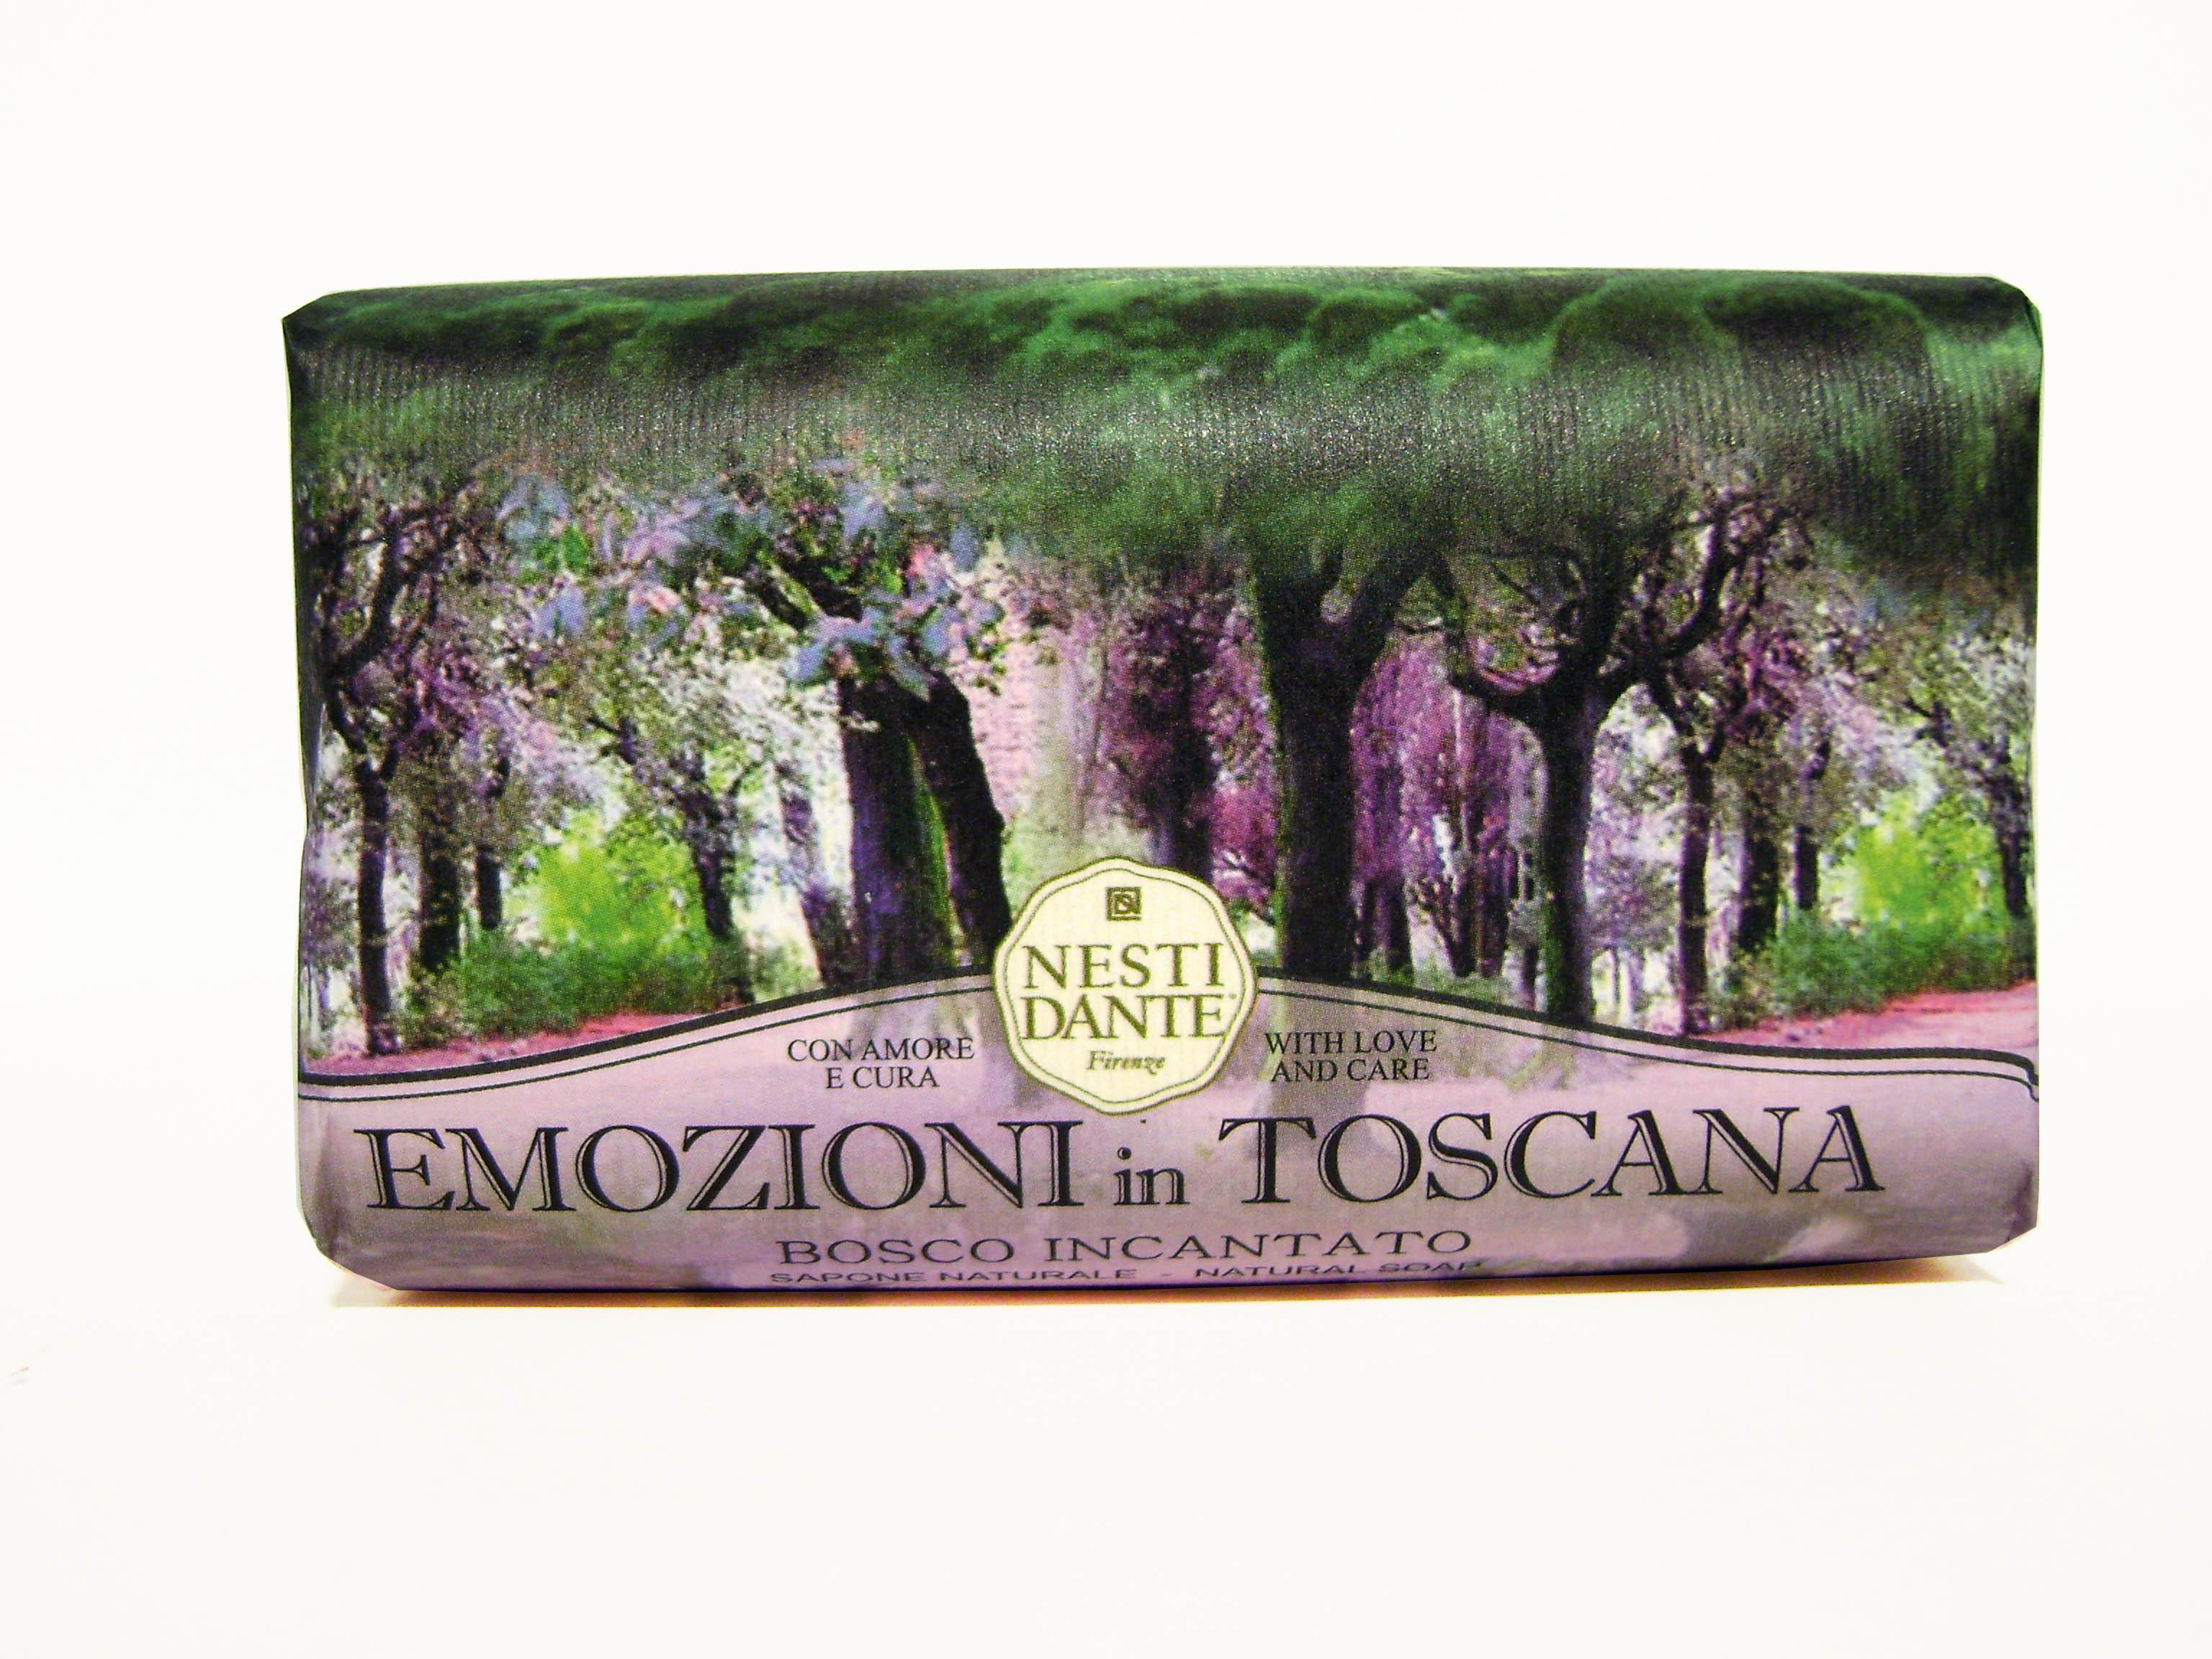 Emozioni In Toscana - Bosco Incantato, Viola, large image number 0